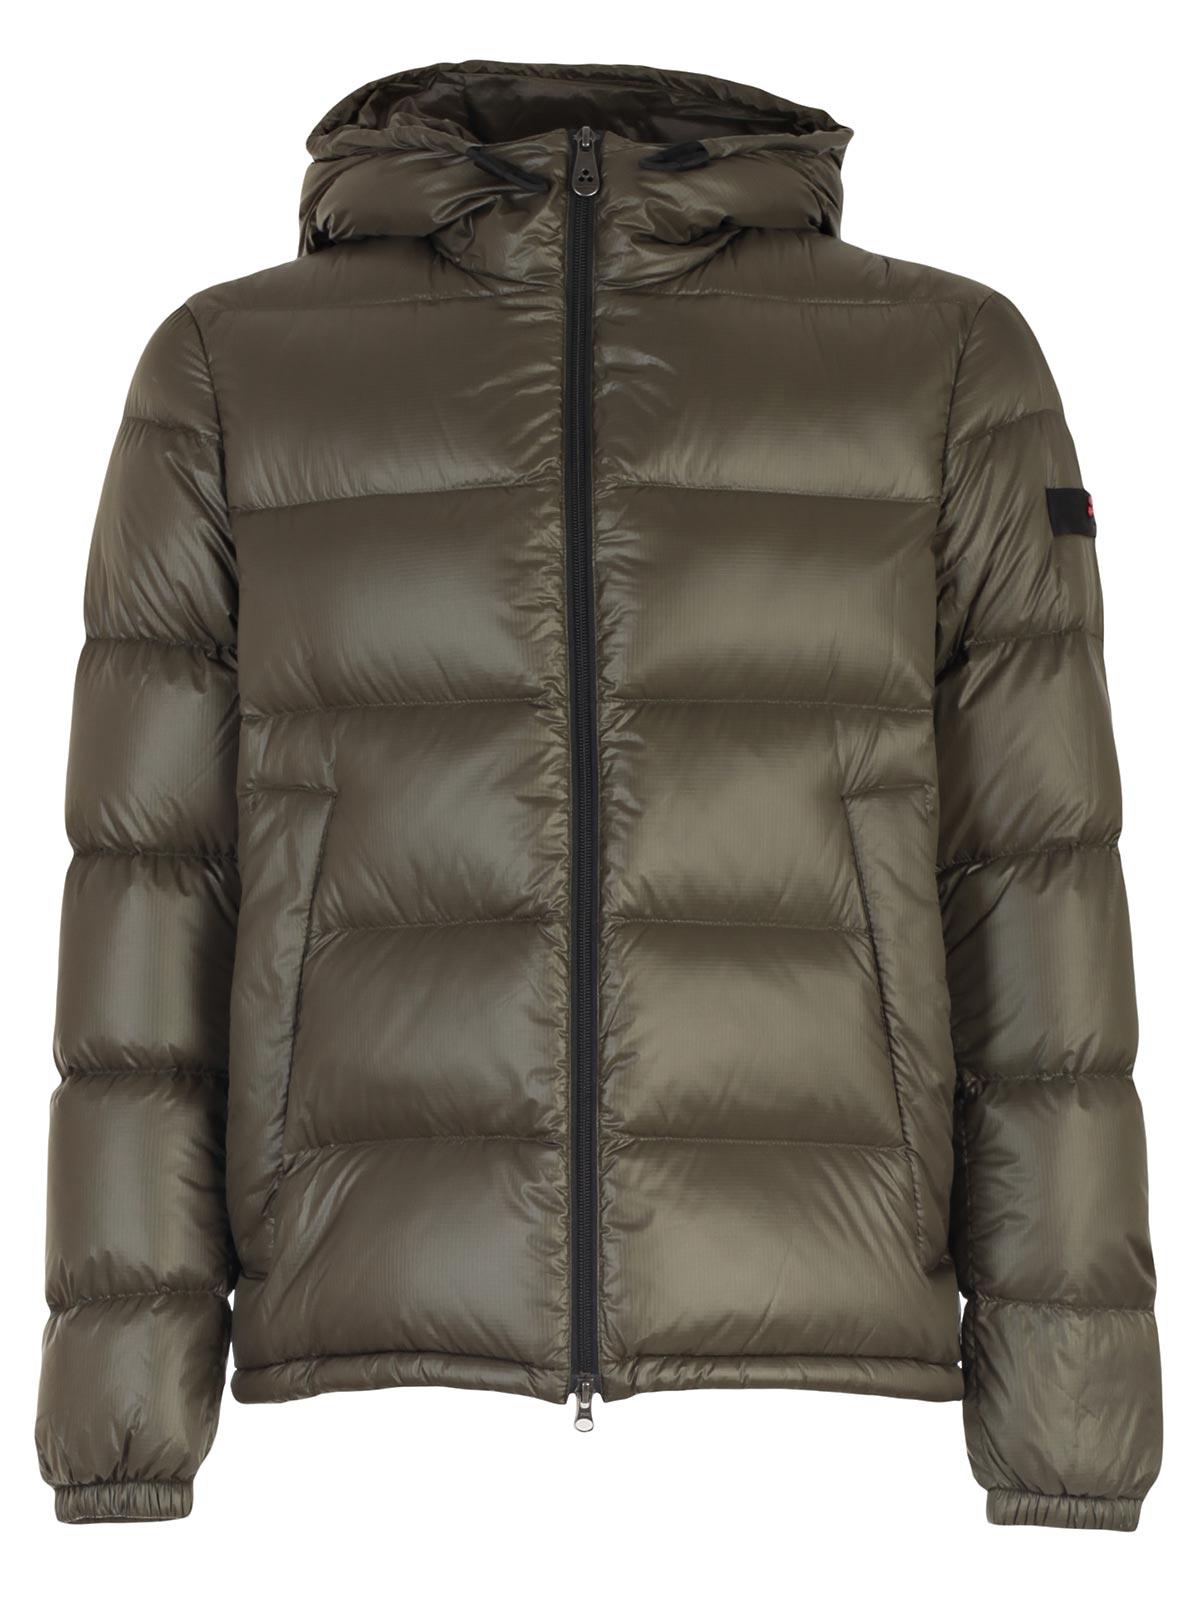 timeless design ff818 83c29 Peuterey Jacket